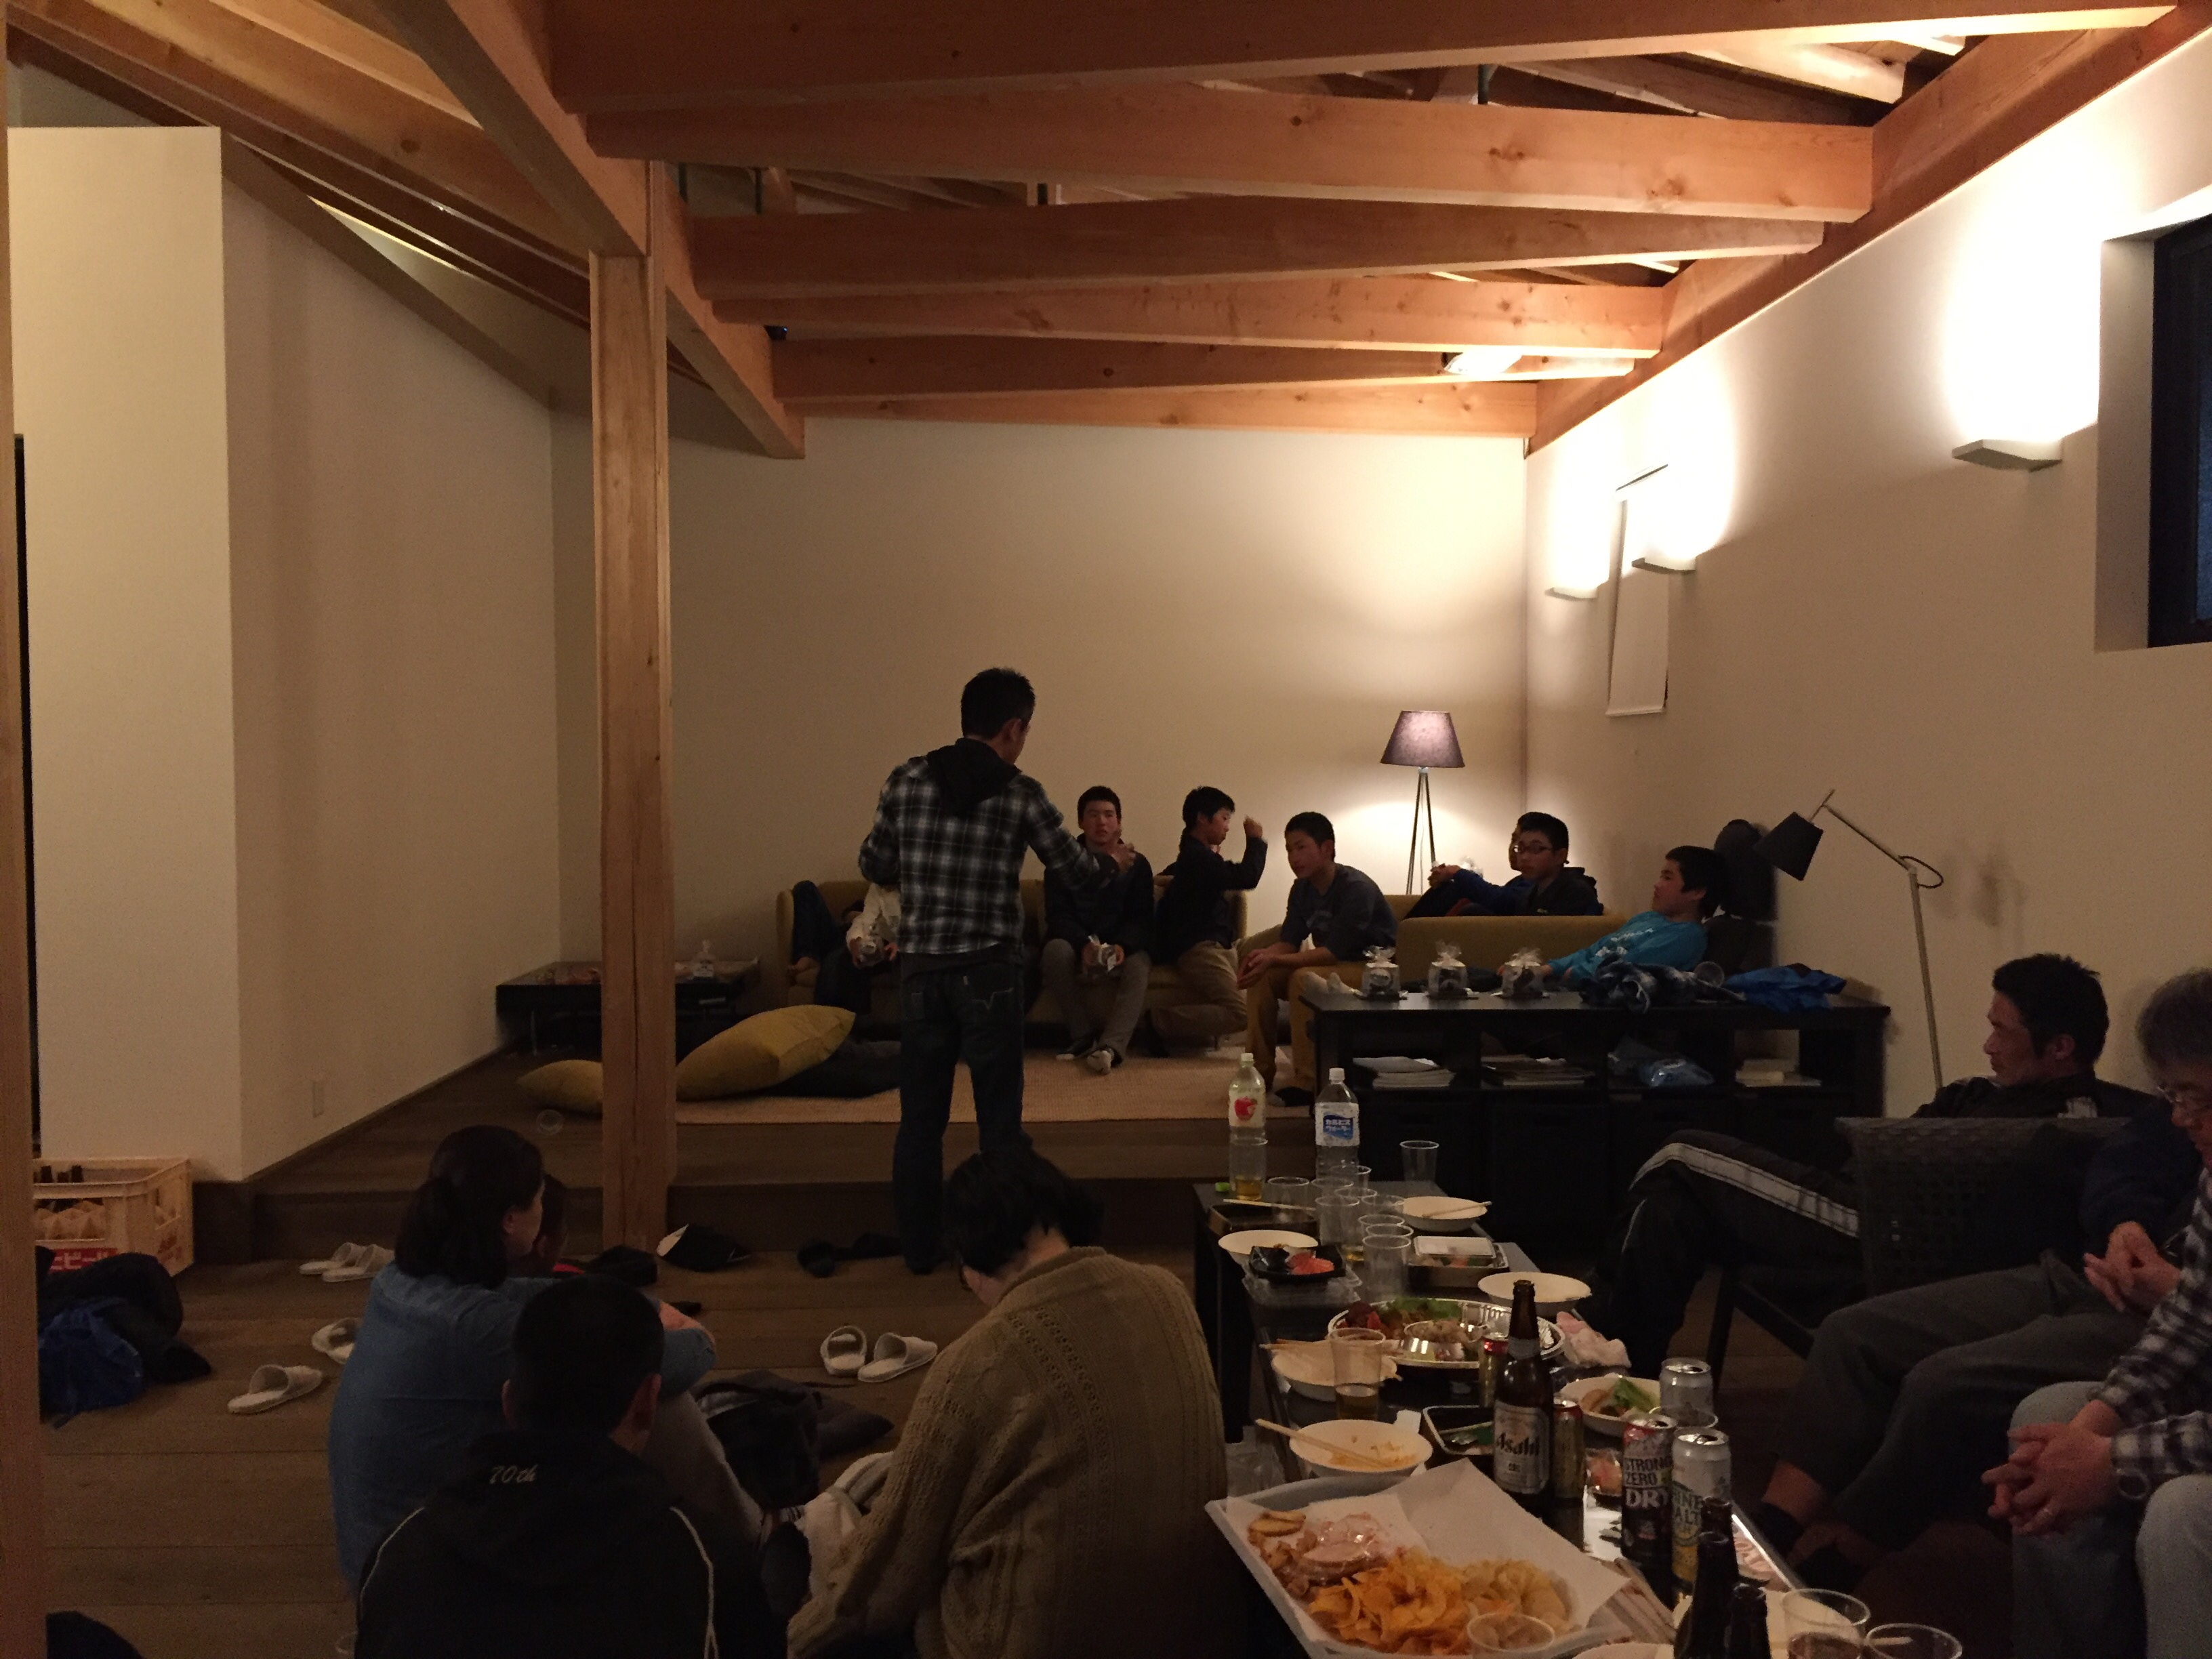 2016.03.27 スポーツ少年団_少年野球_6年生野球_卒団03